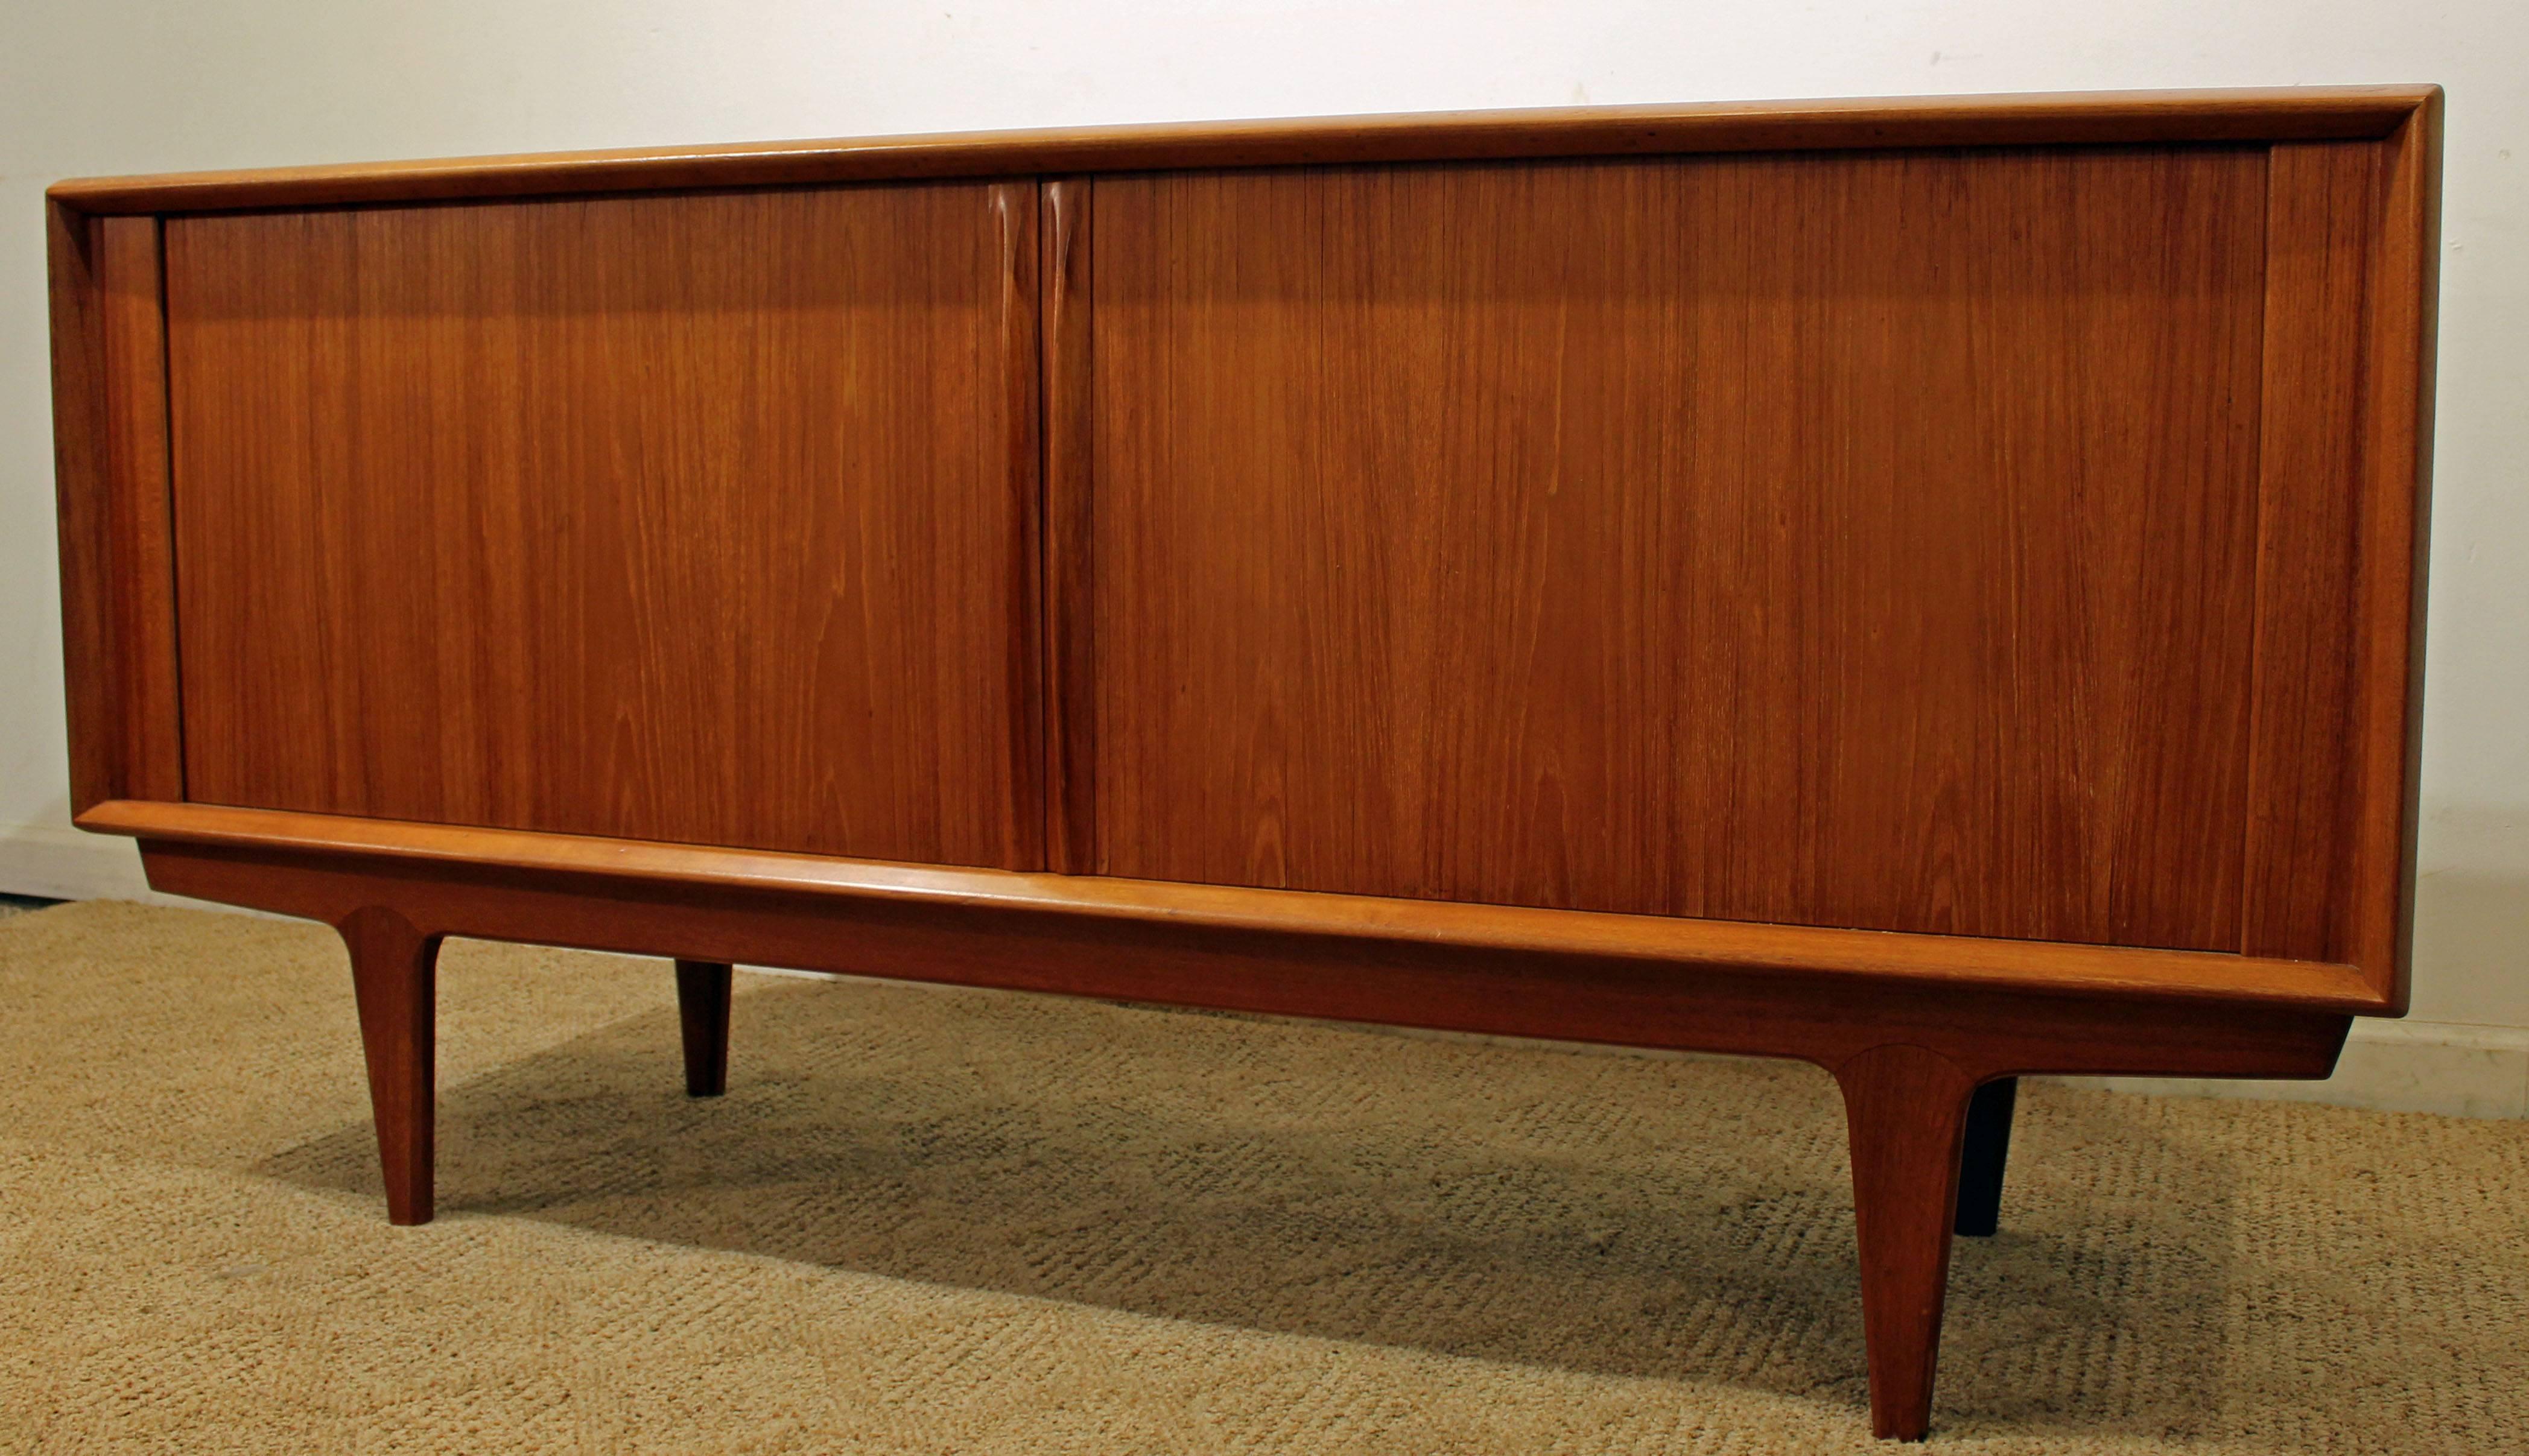 Danish Modern Credenza For Sale : Danish modern bernhard pedersen and son teak tambour door